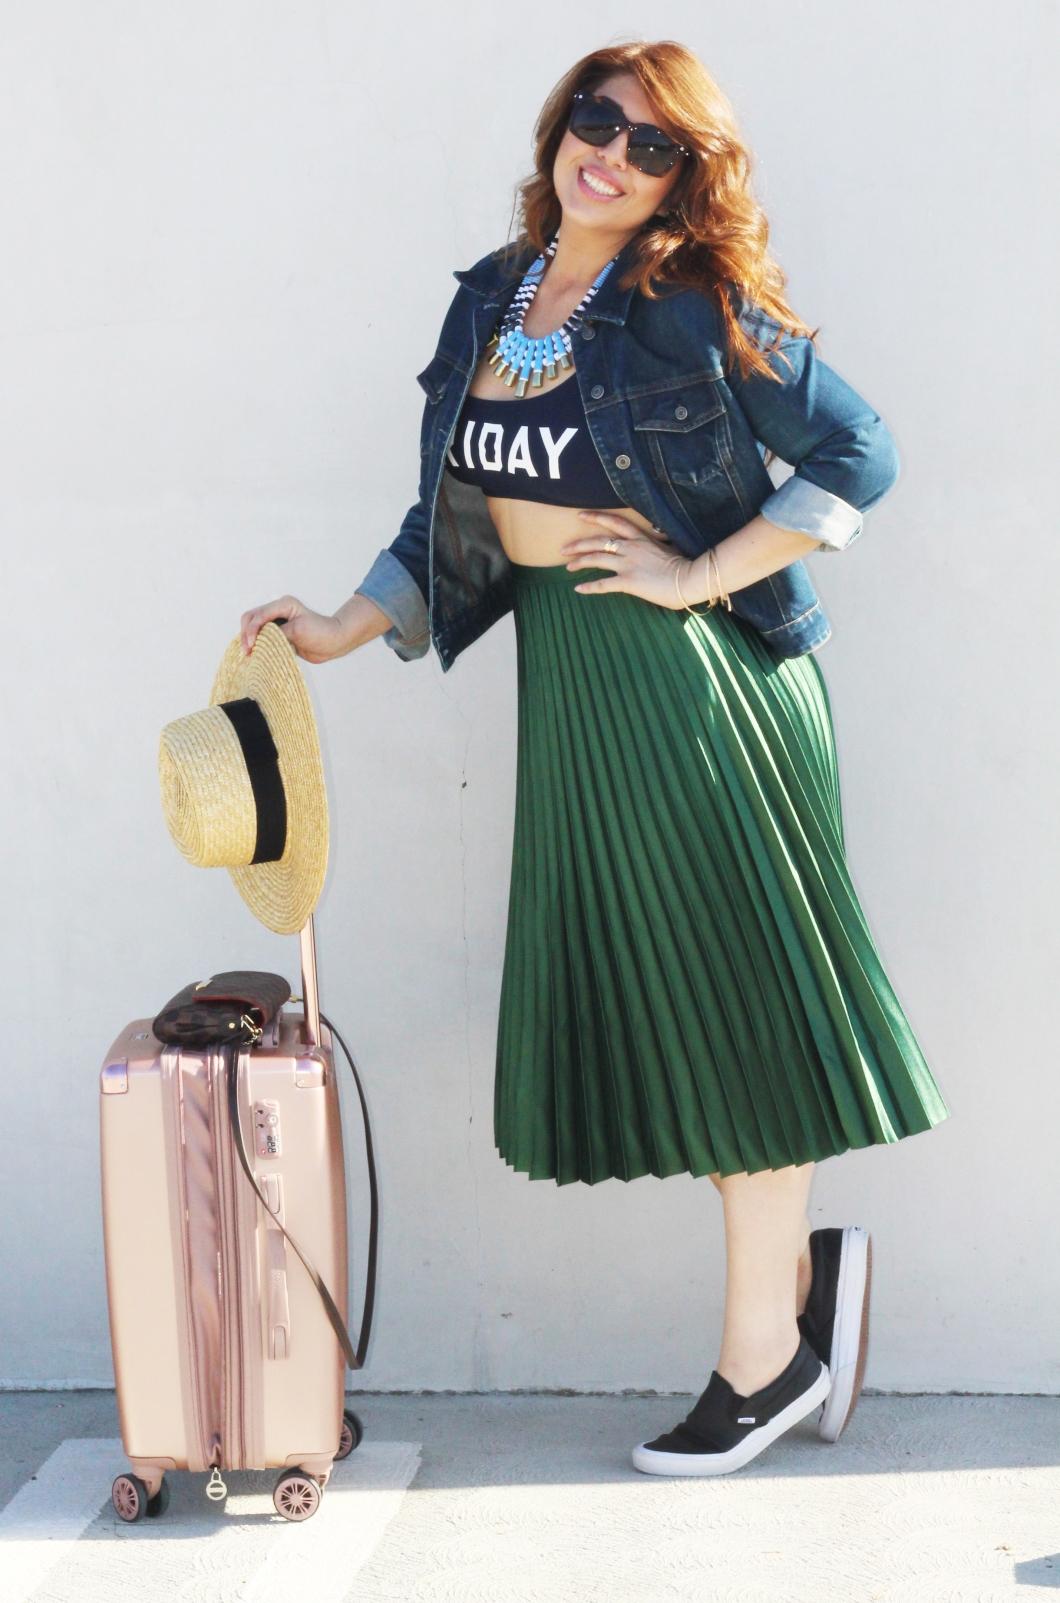 Zara green skirt_05_luggage